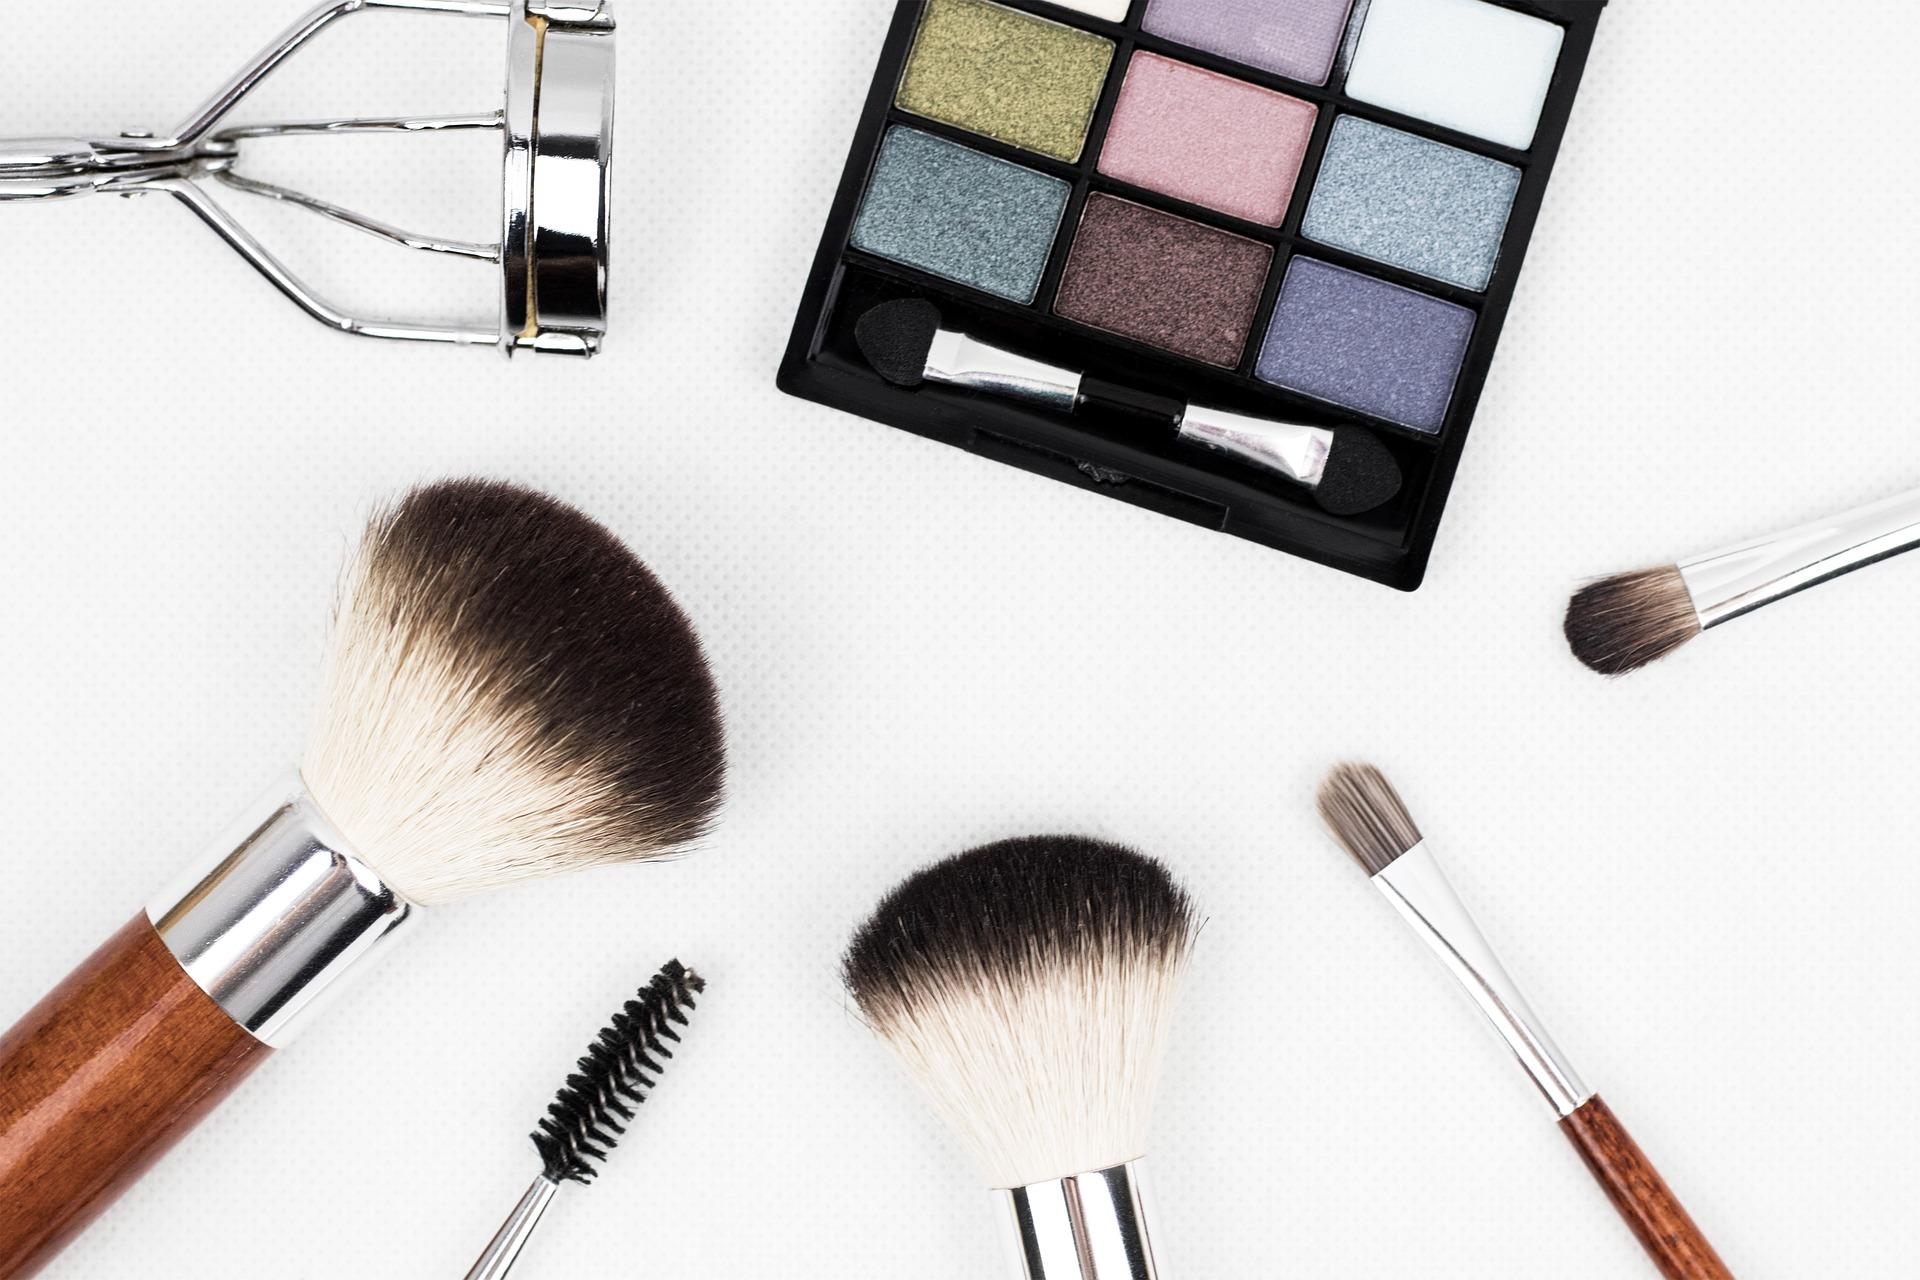 Ulta vs Sephora: Makeup Price Comparison - She Tried What